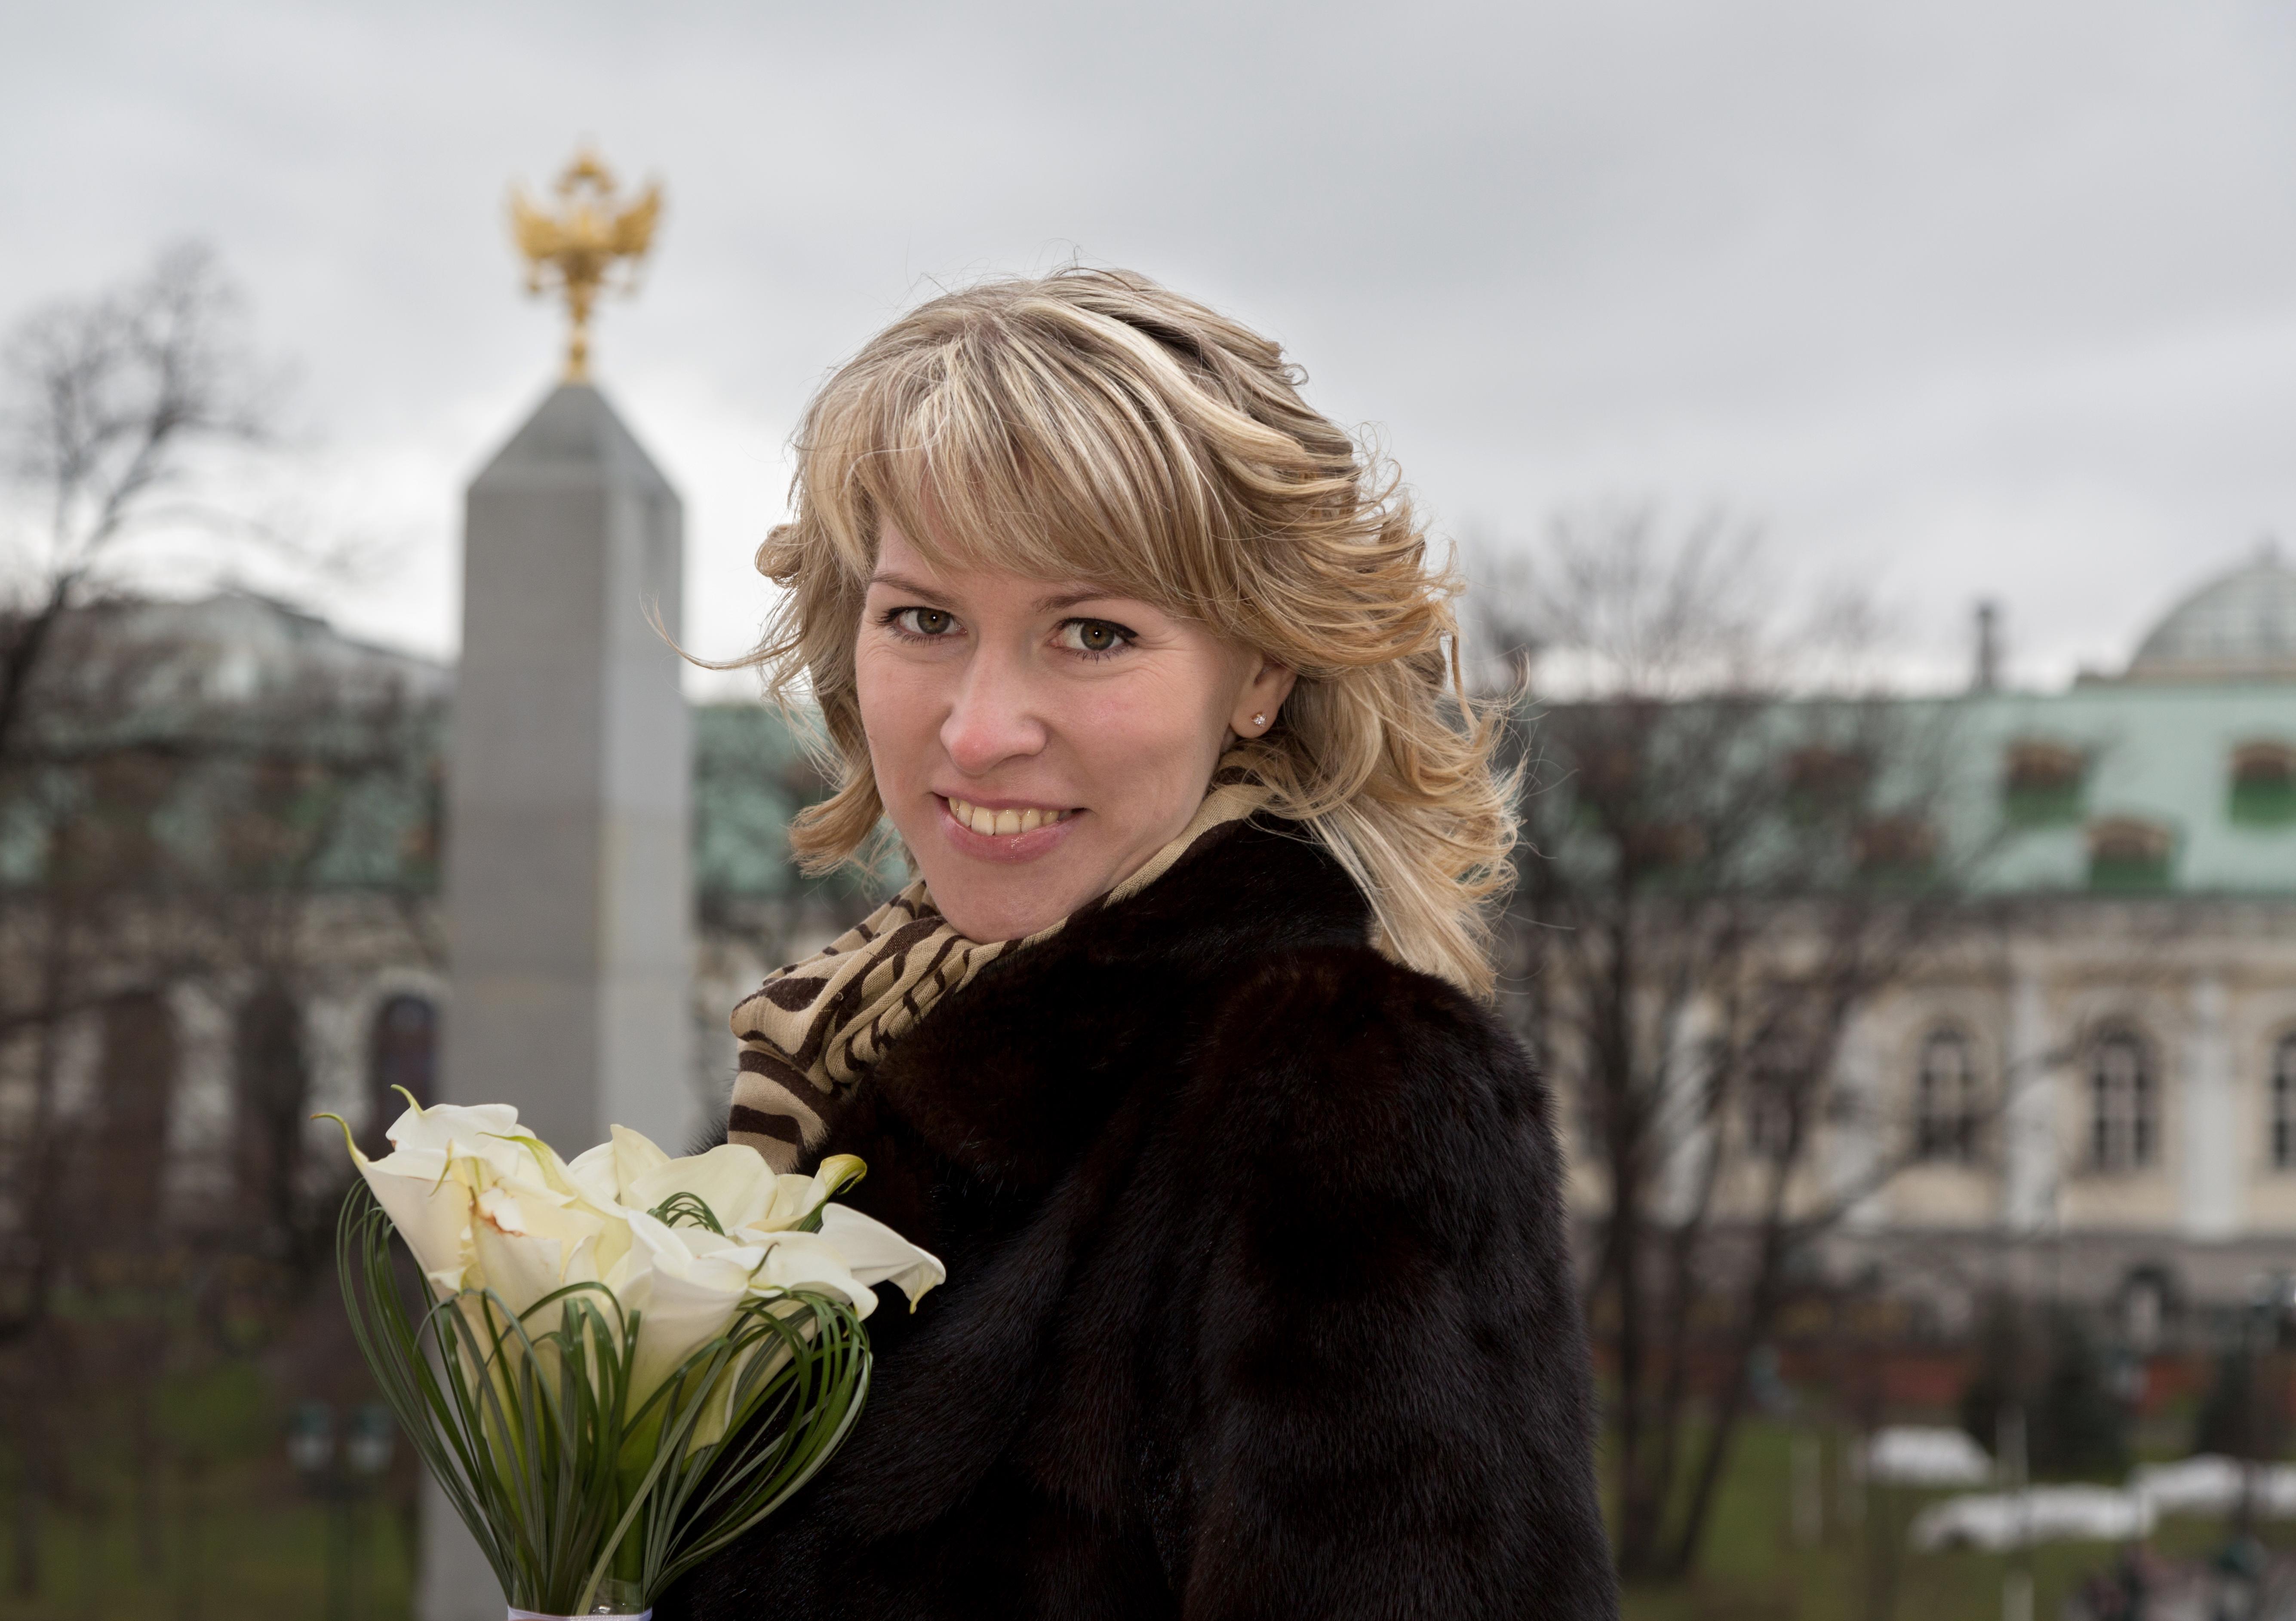 Свадьба Вани и Маши  25.12.2015 www.mergaliev.com-178.jpg